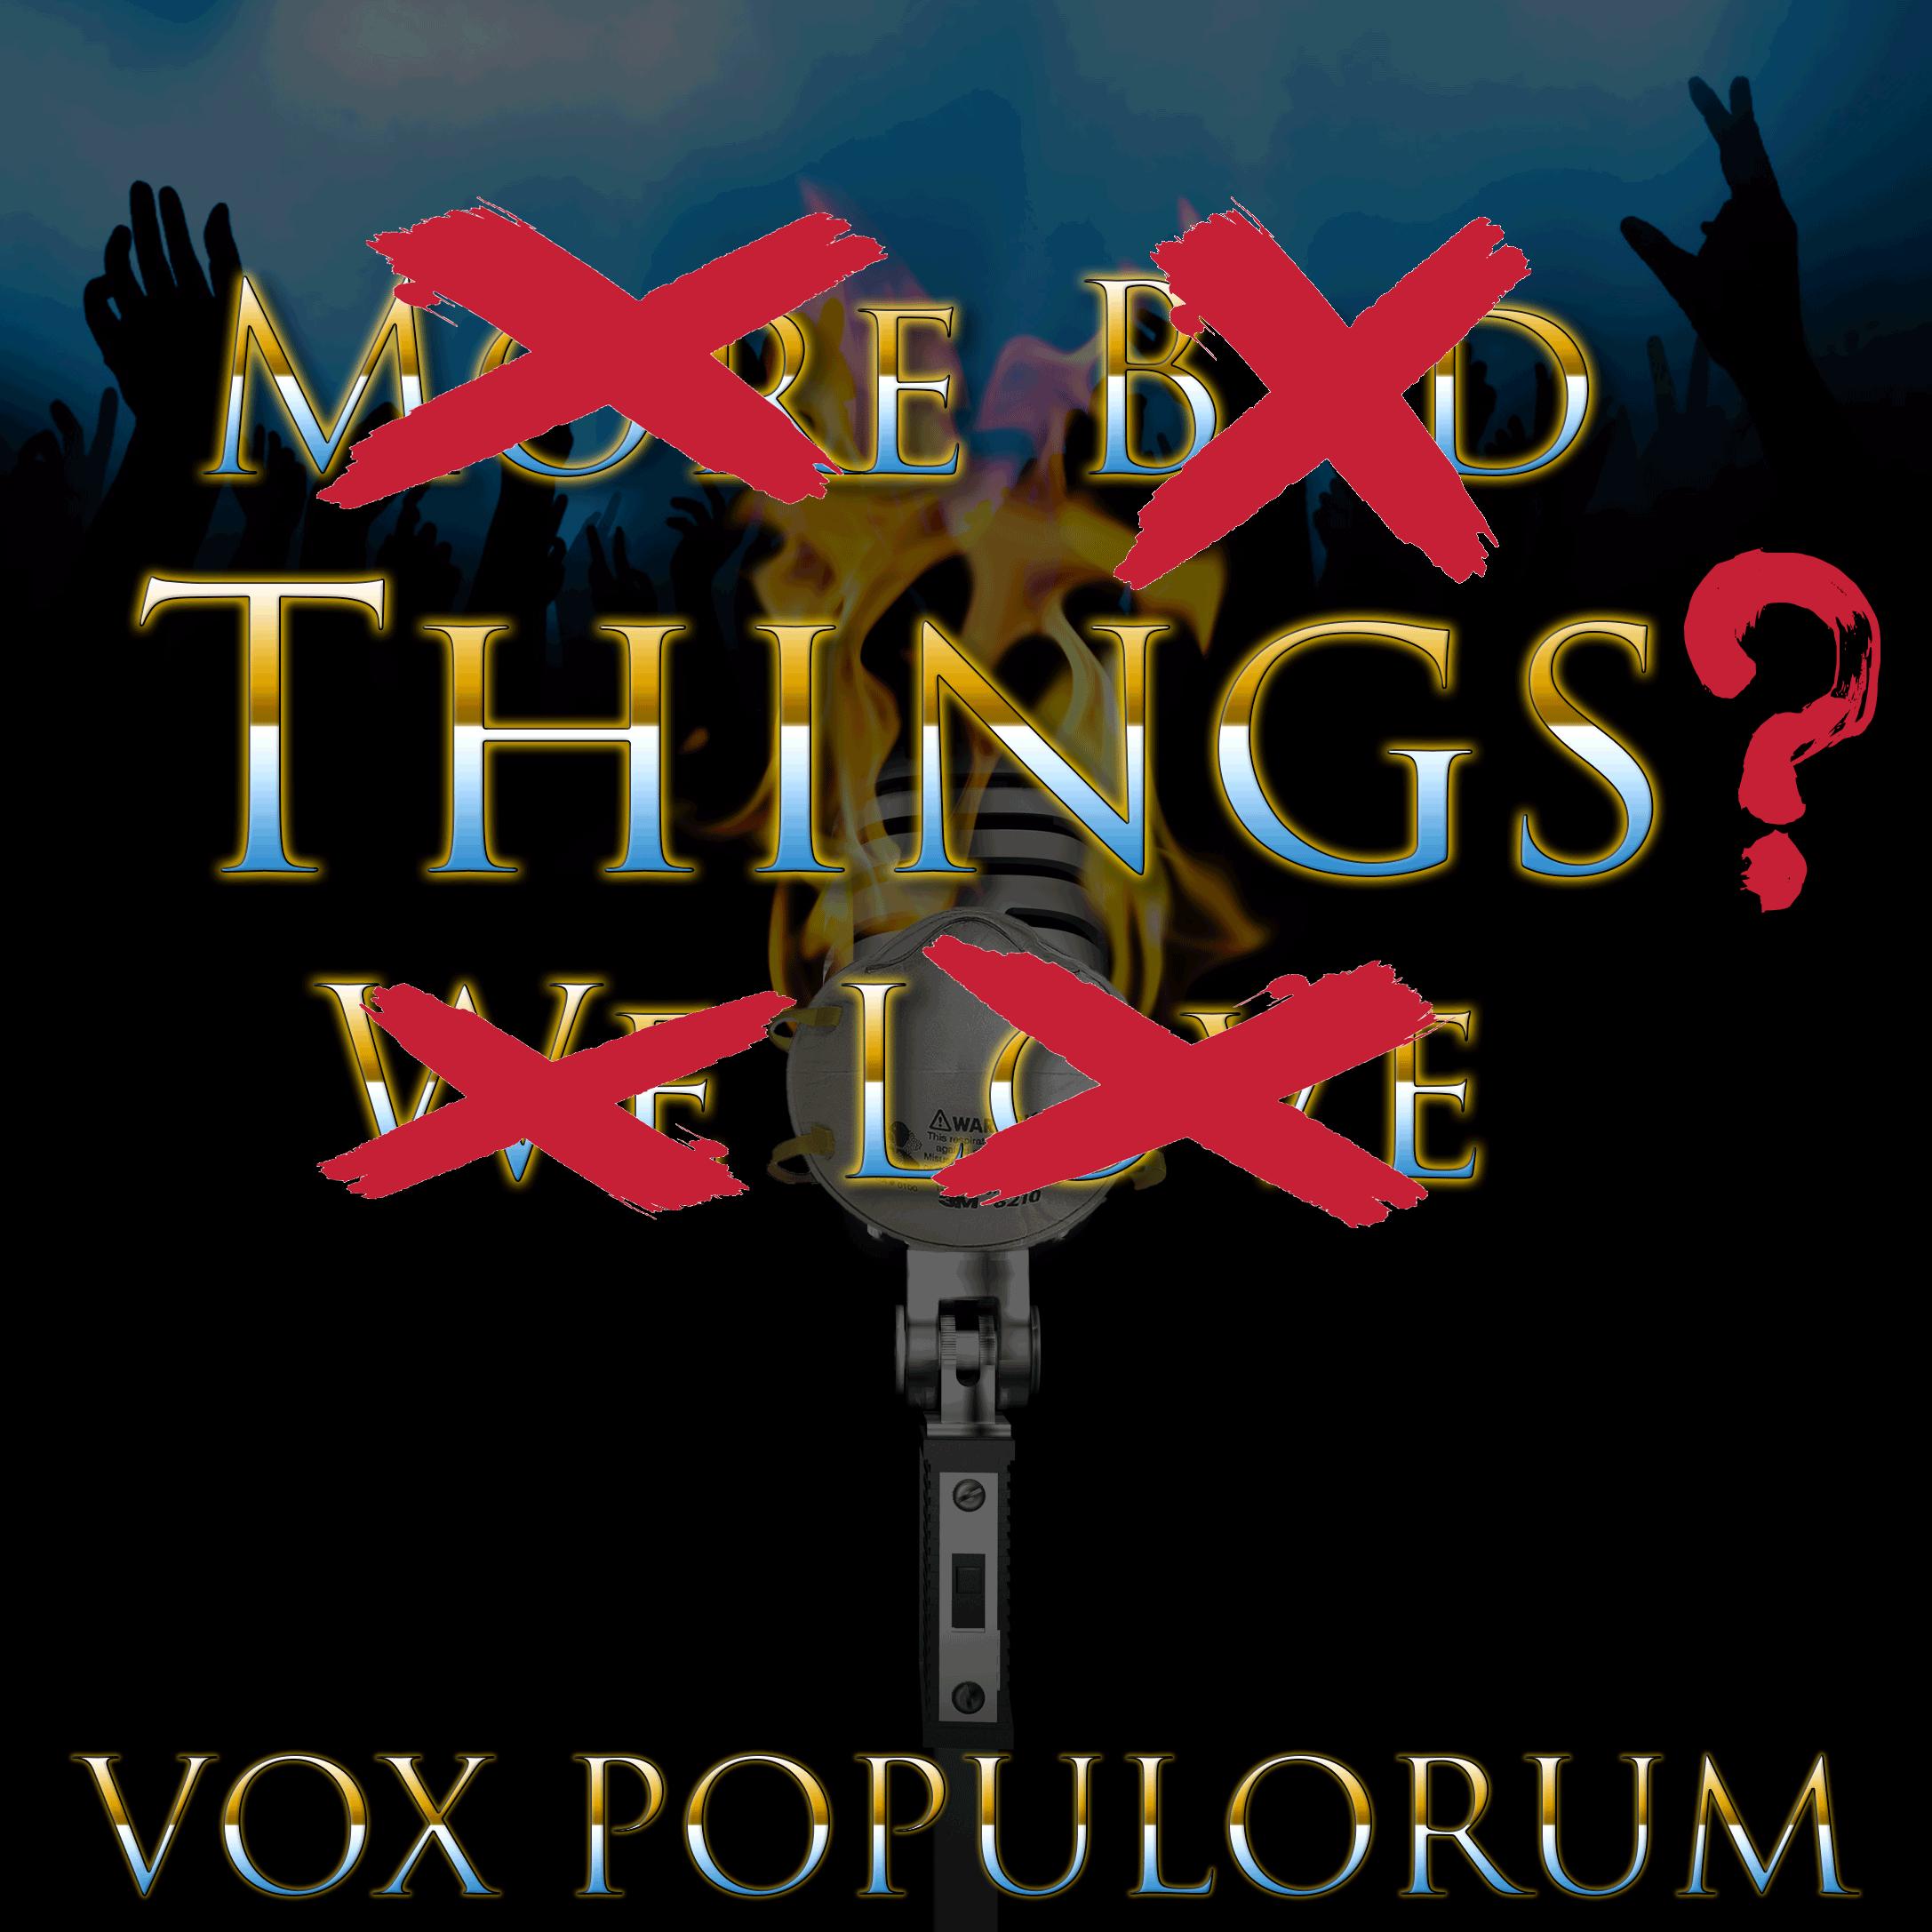 The VoxPopcast